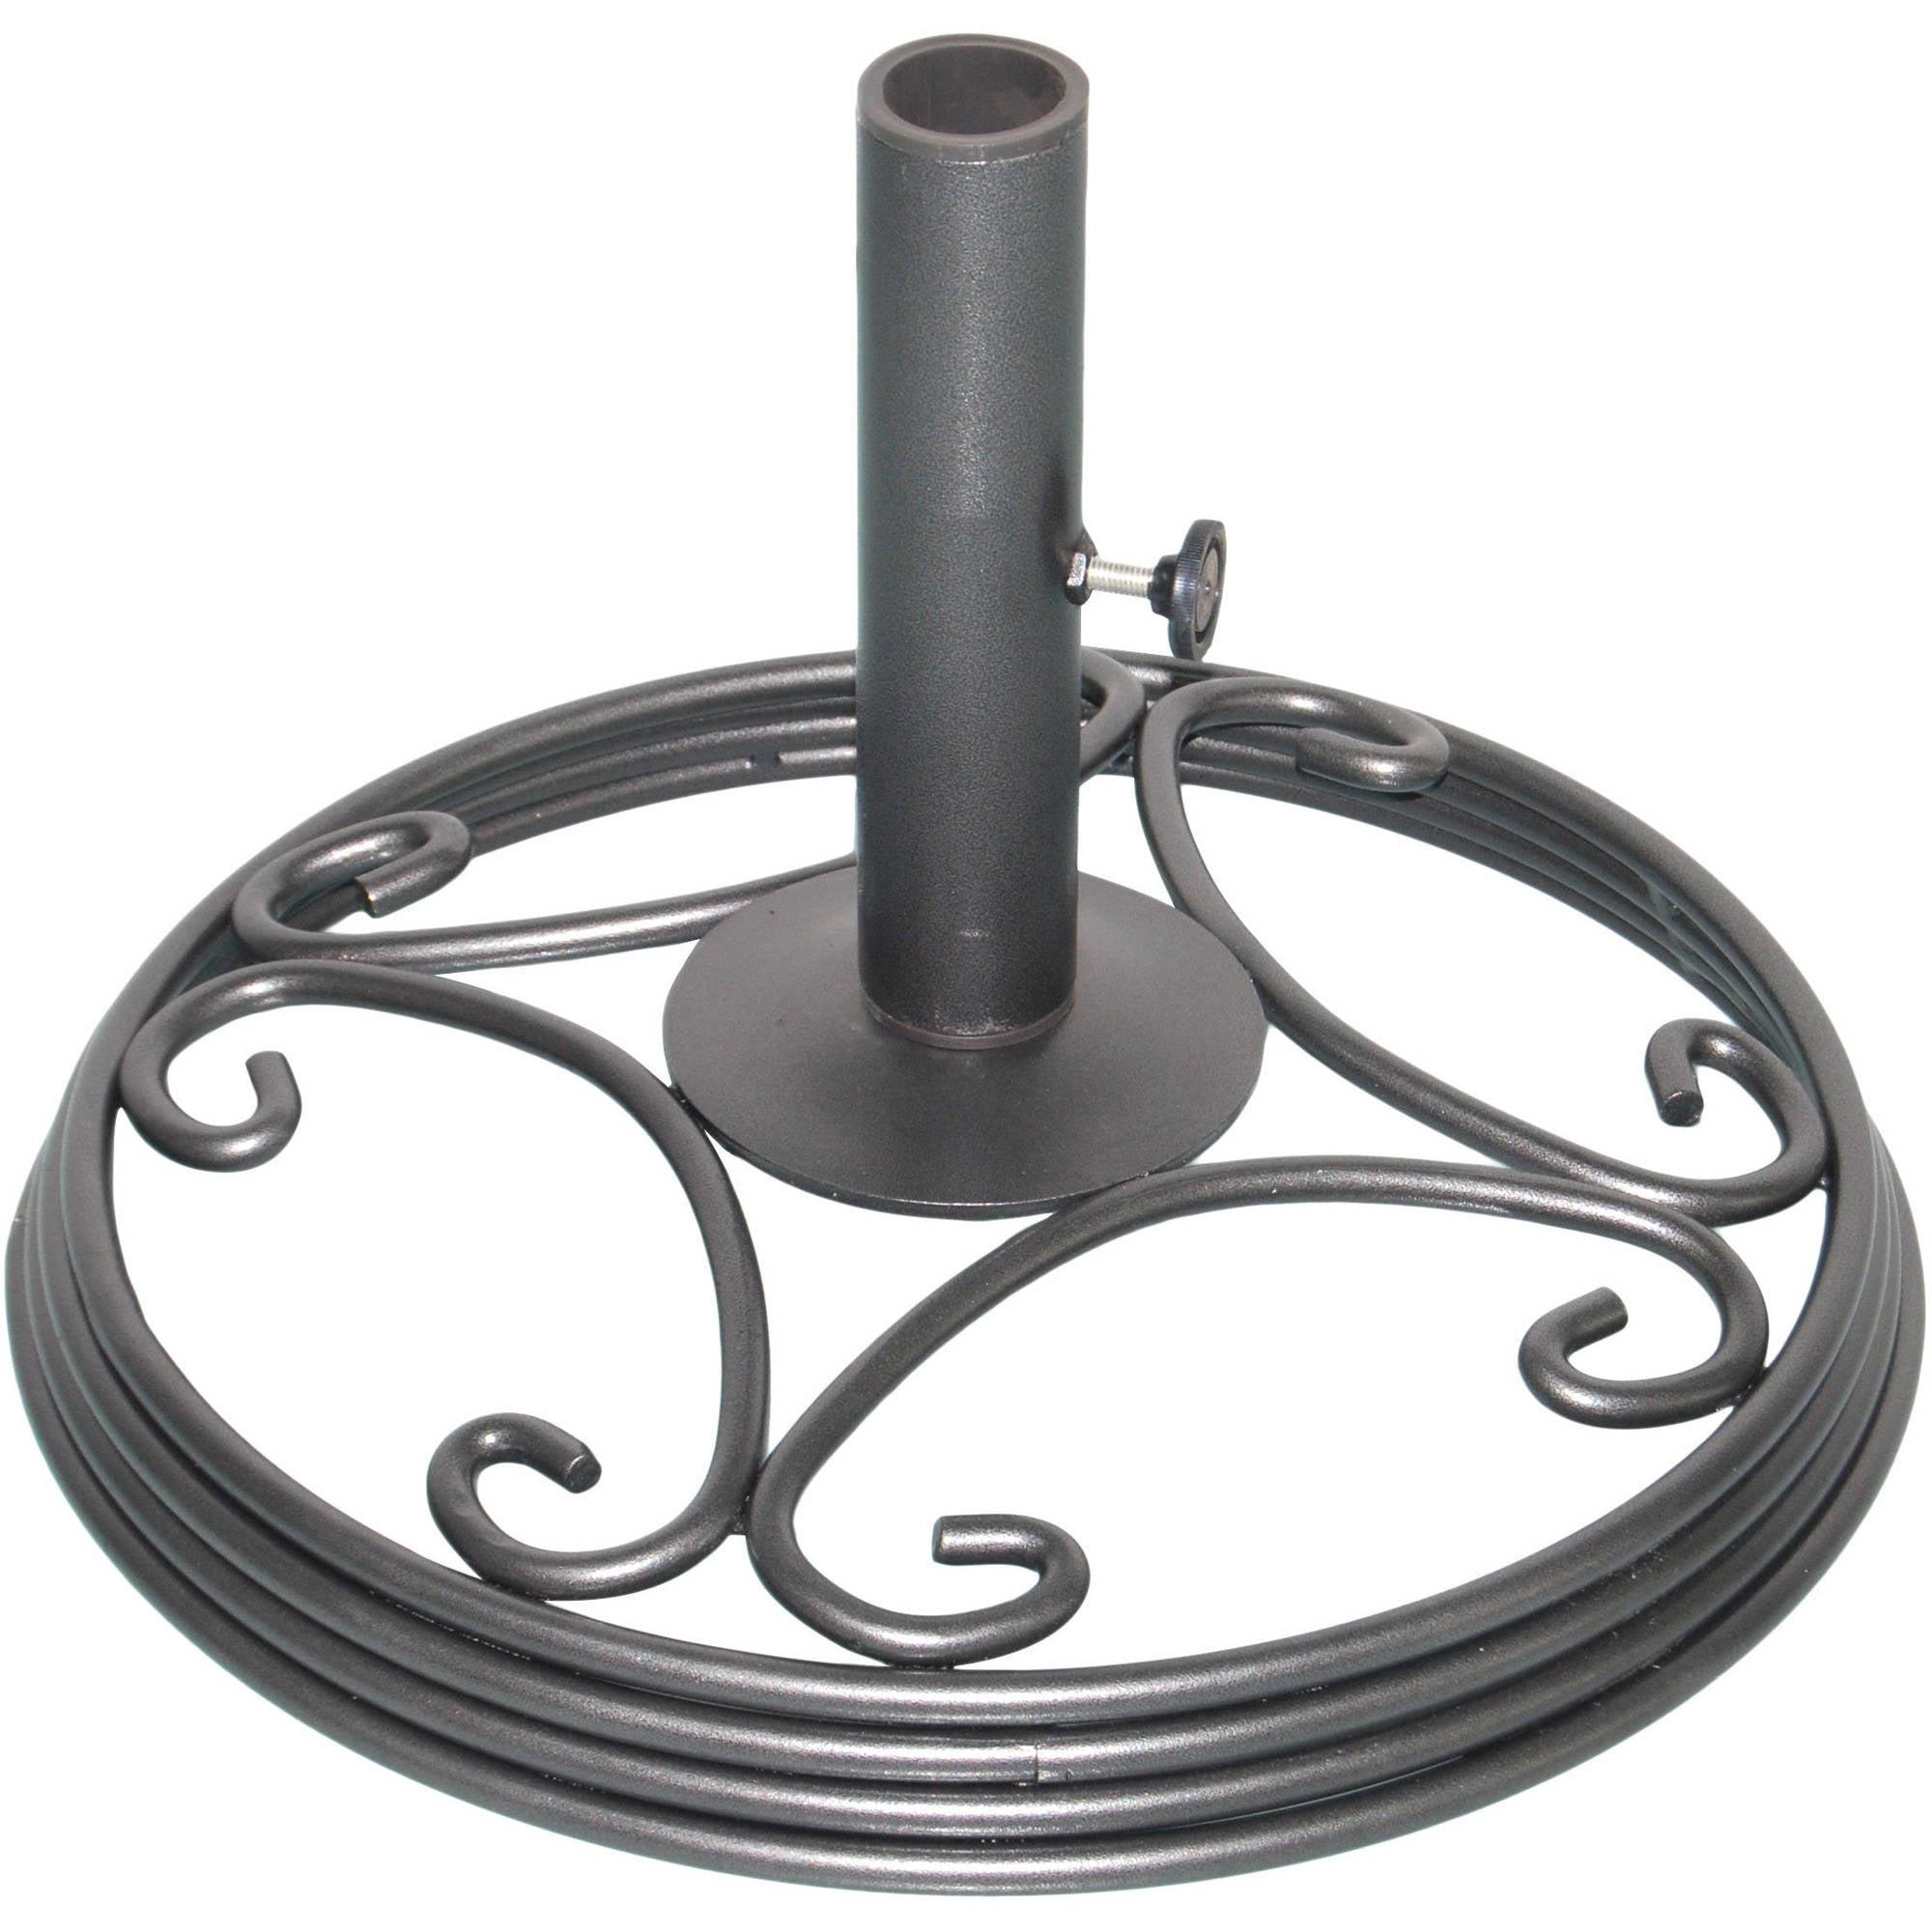 mainstays willow springs umbrella base black finish - Umbrella Base